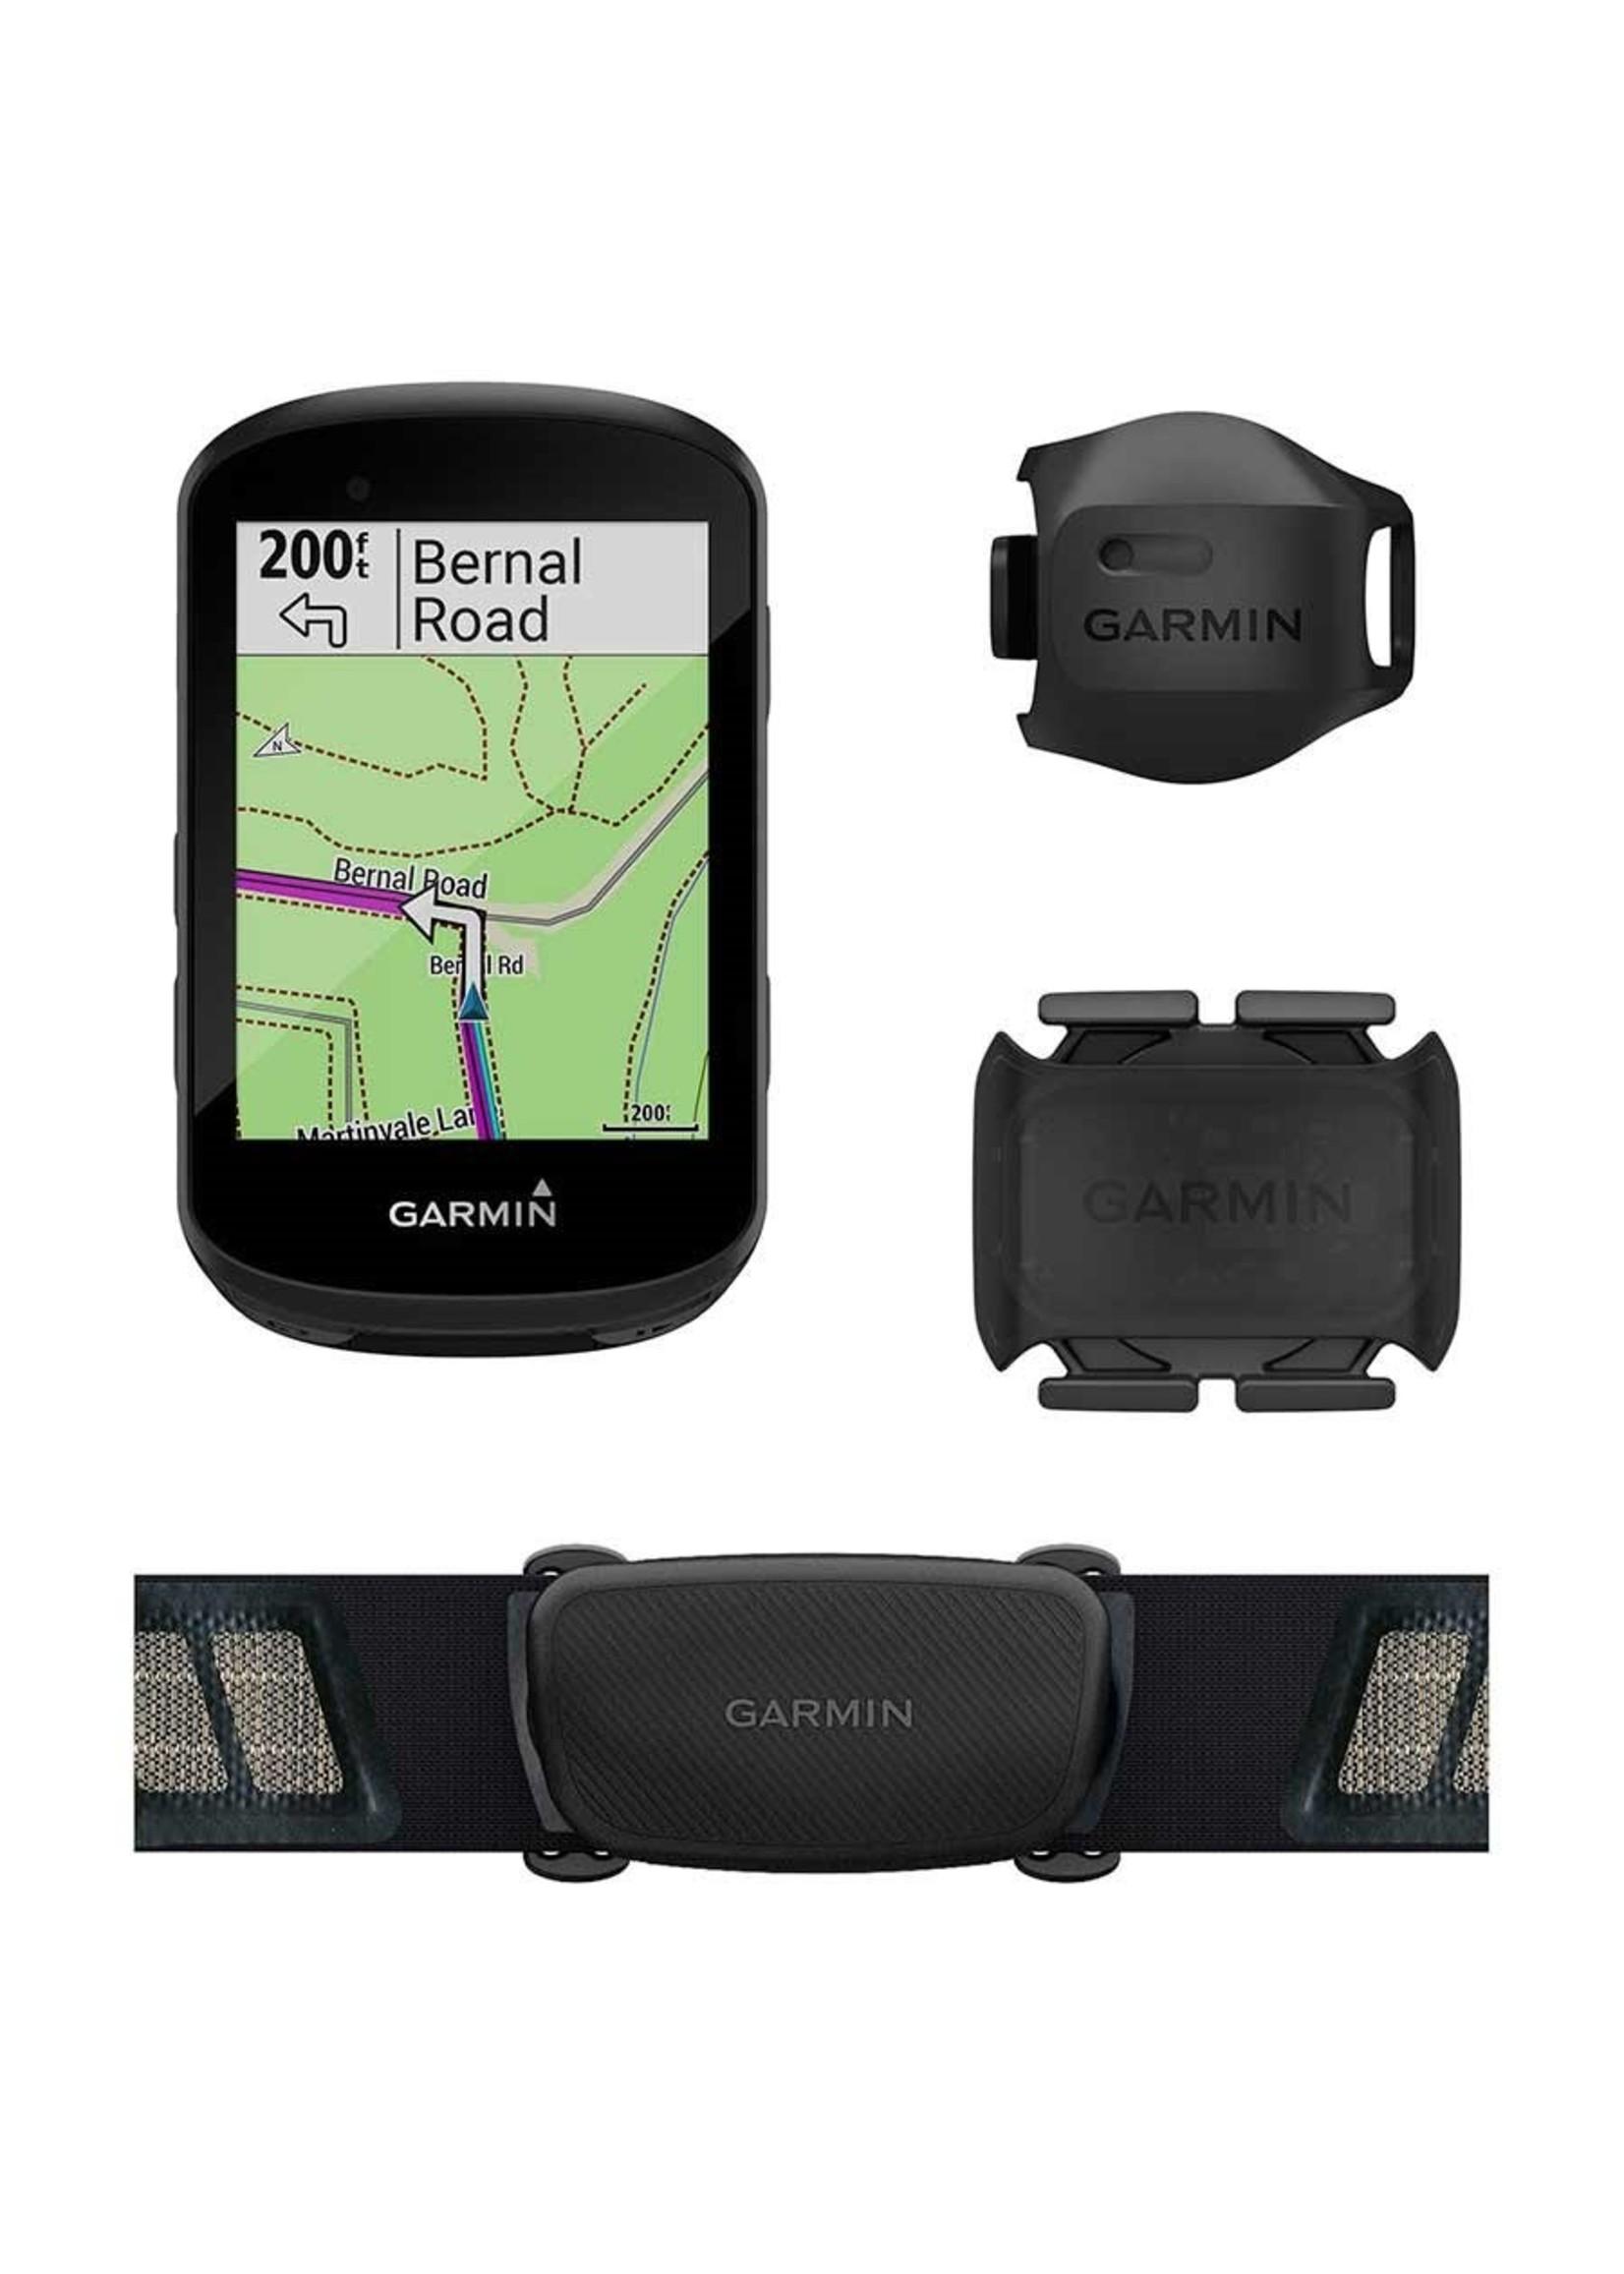 Garmin Garmin, Edge 530, Cyclometre, GPS: Oui, Cardio: Oui (Poitrine), Cadence: Oui, Noir, 010-02060-10